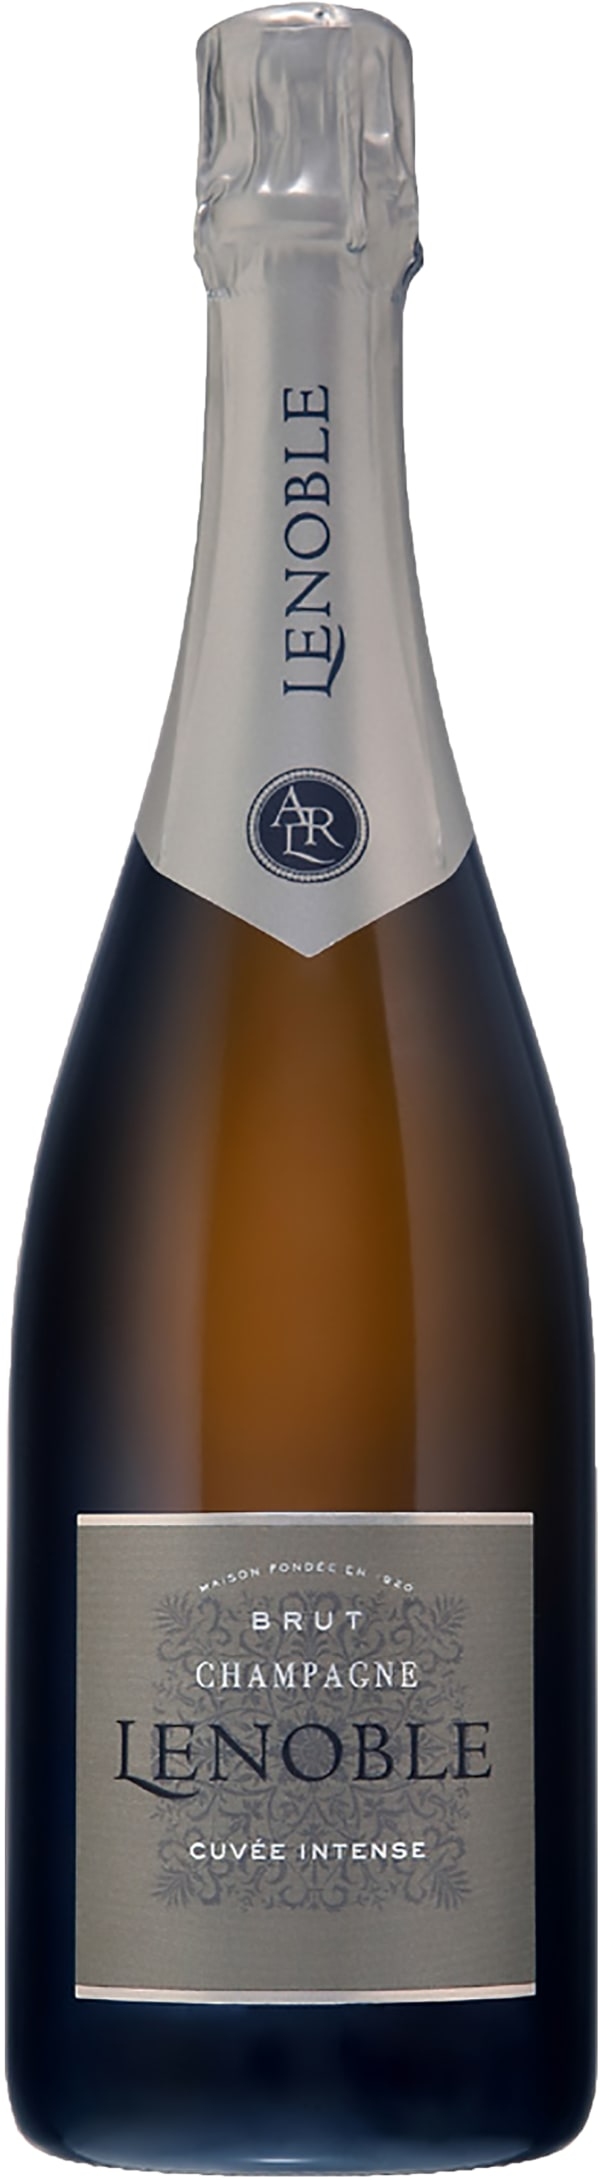 Lenoble Cuvée Intense Champagne Brut